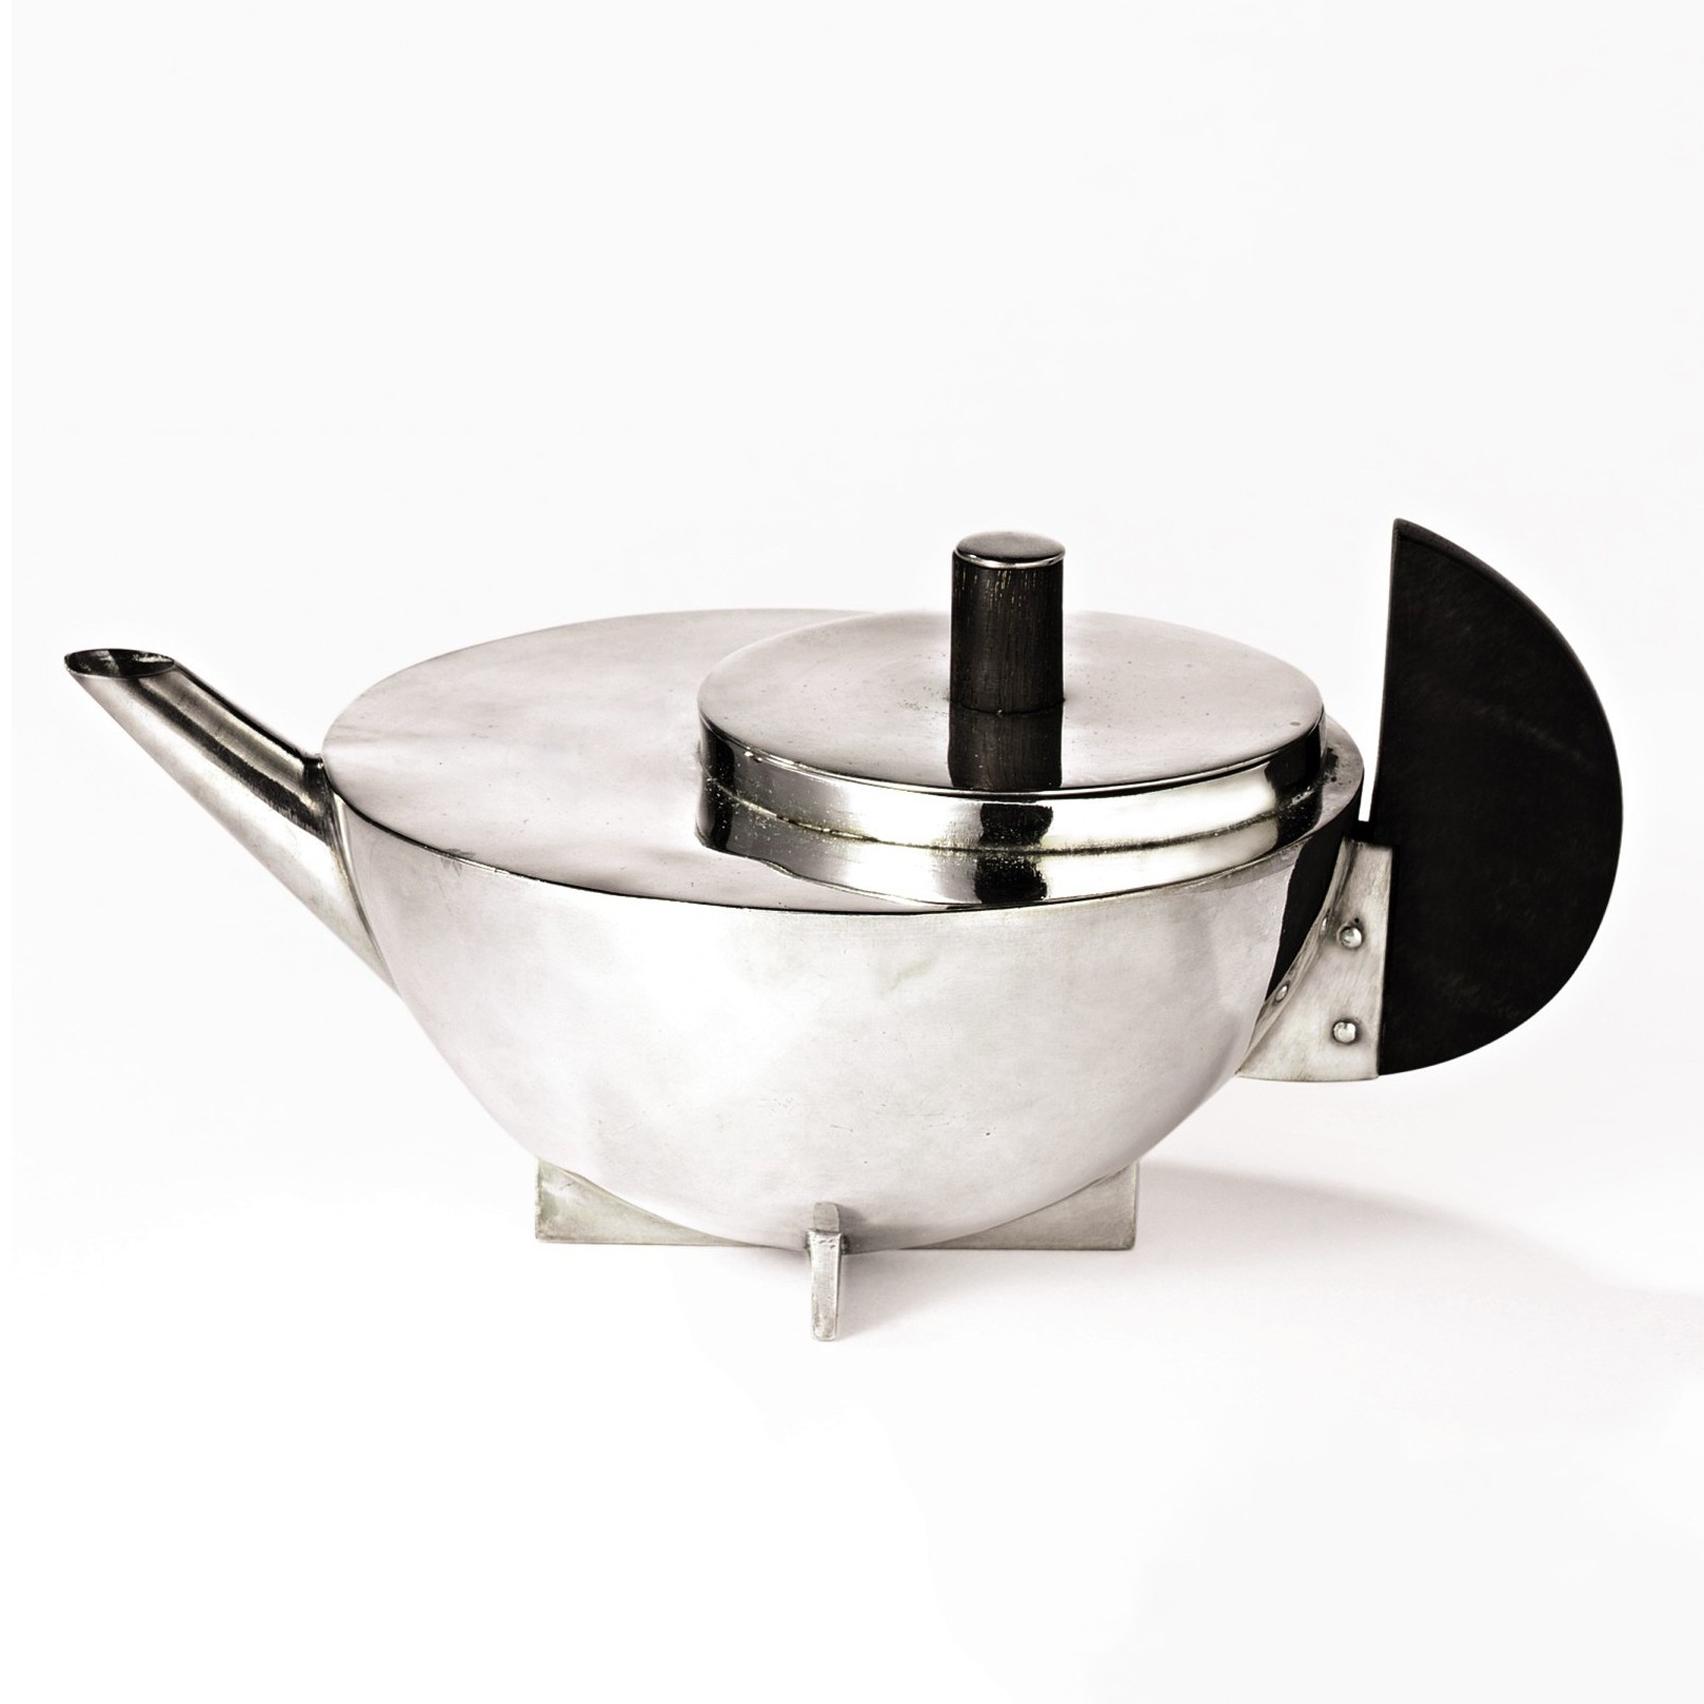 Ấm trà thiết kế bởi Marianne Brandt